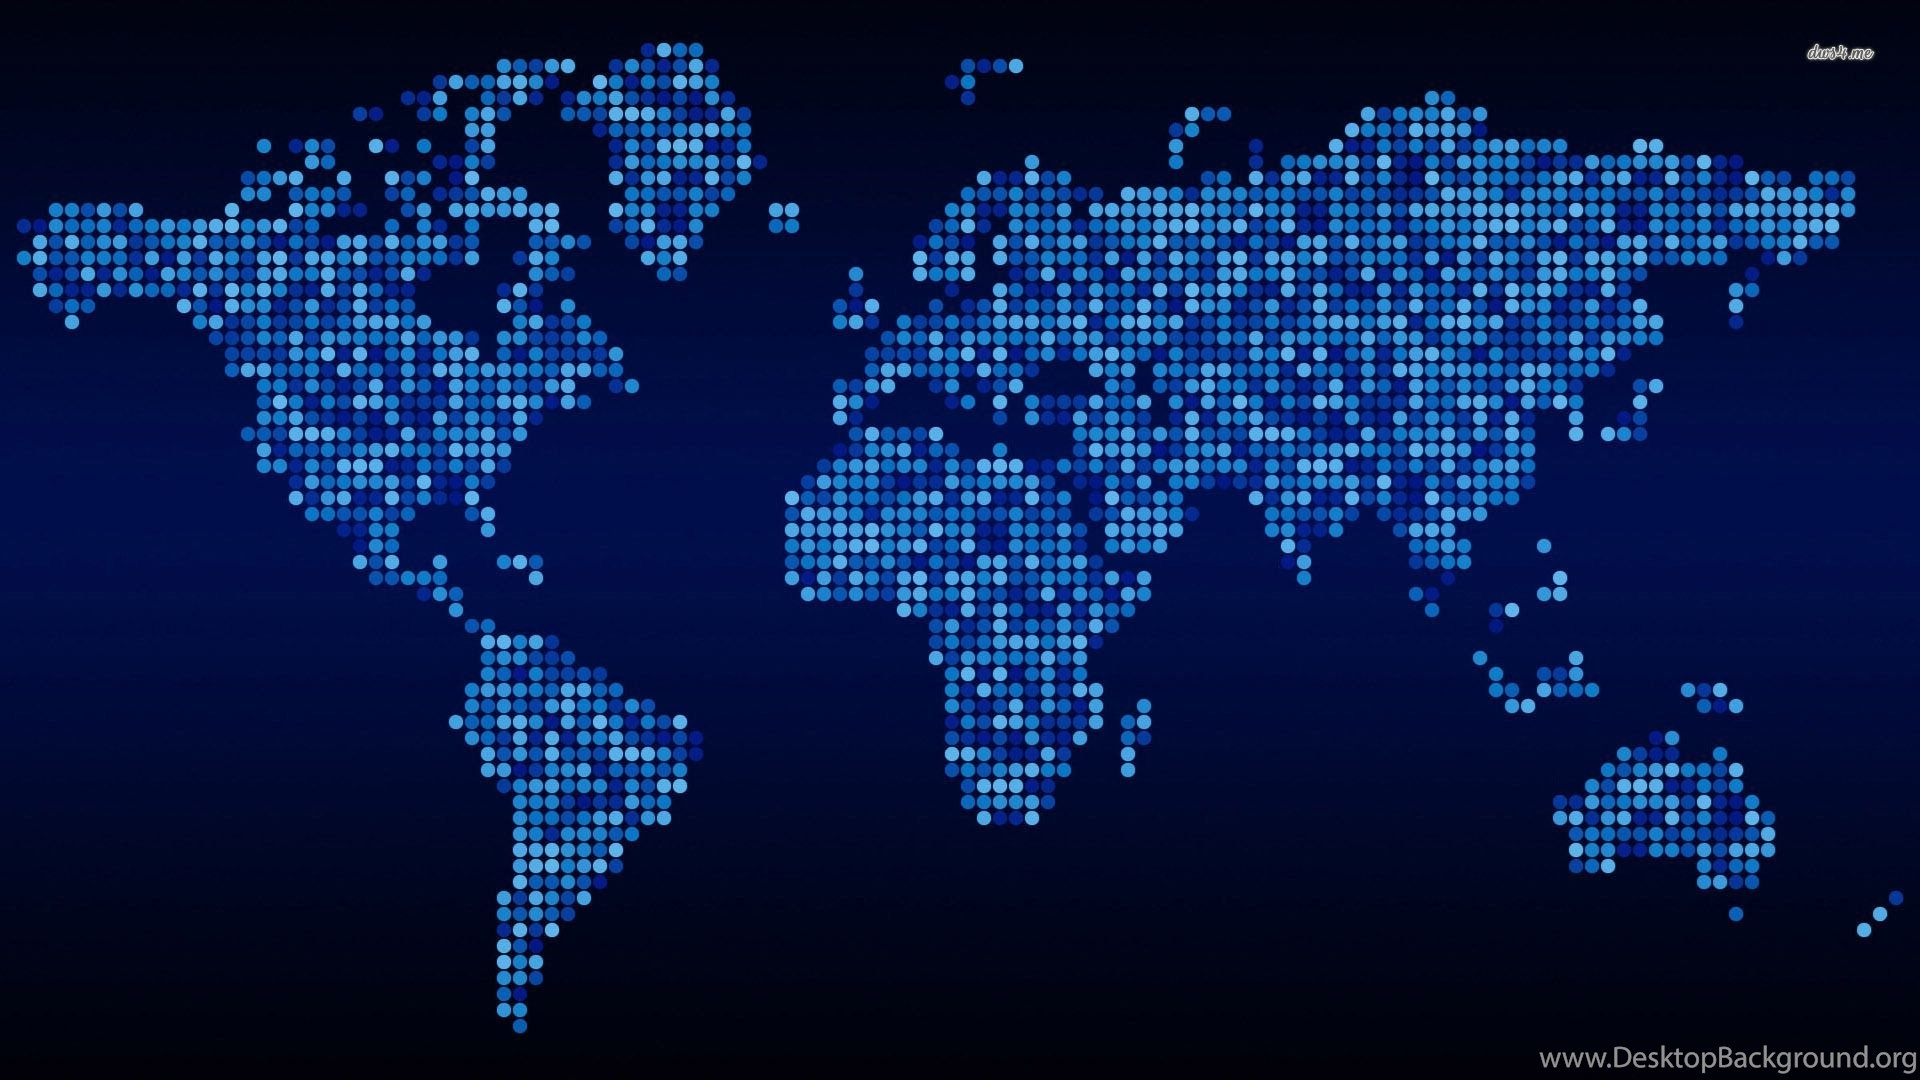 World map wallpapers impremedia popular gumiabroncs Choice Image